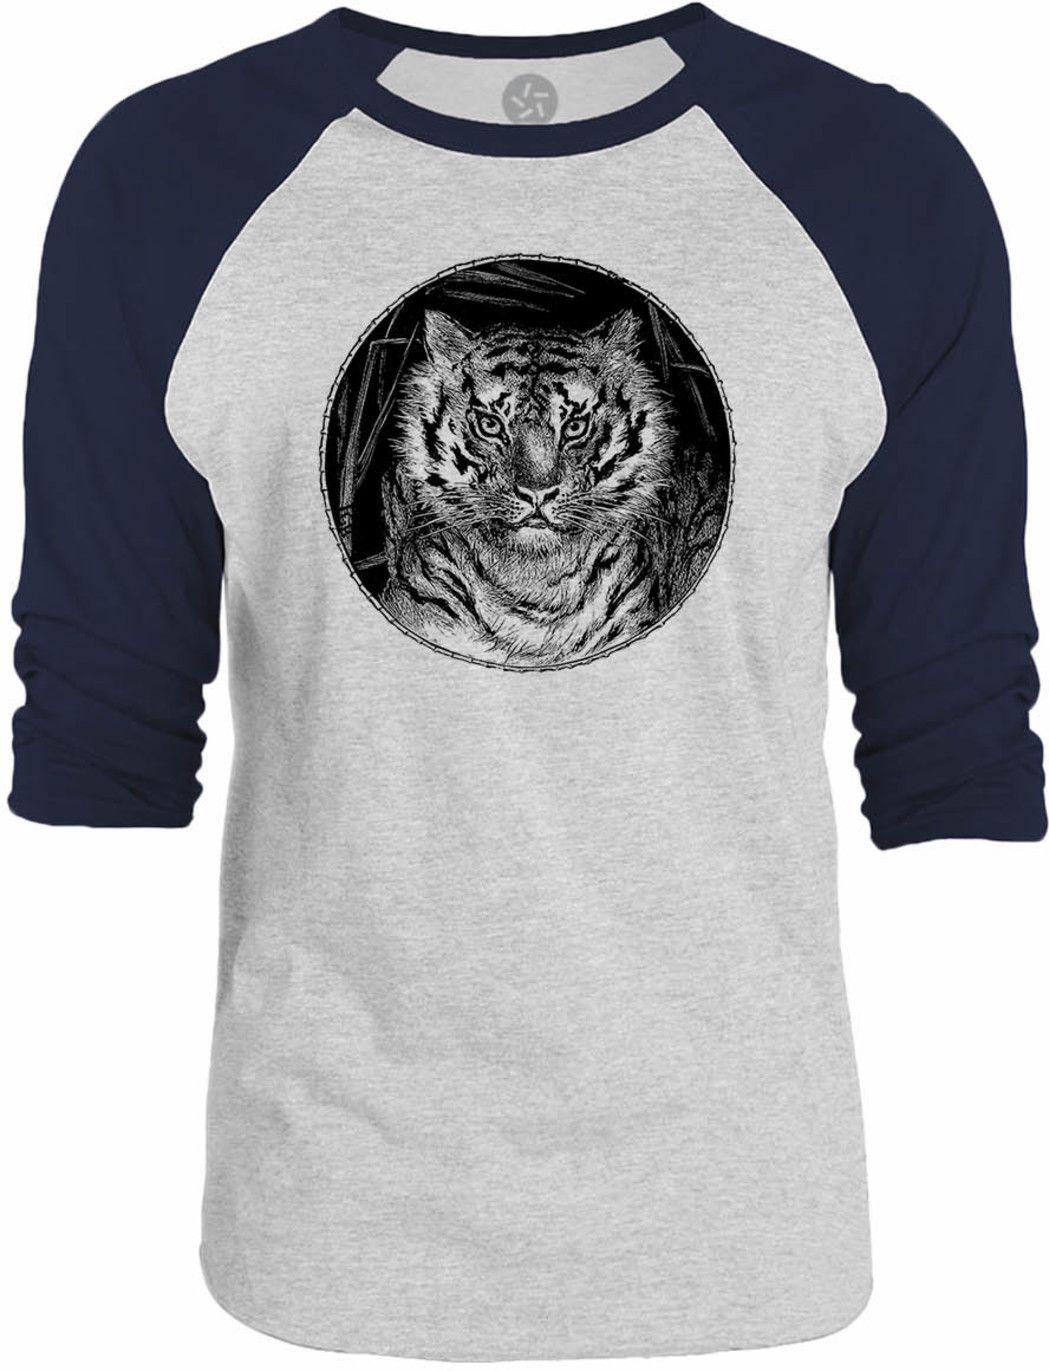 Big Texas Tiger Portrait 3/4-Sleeve Raglan Baseball T-Shirt